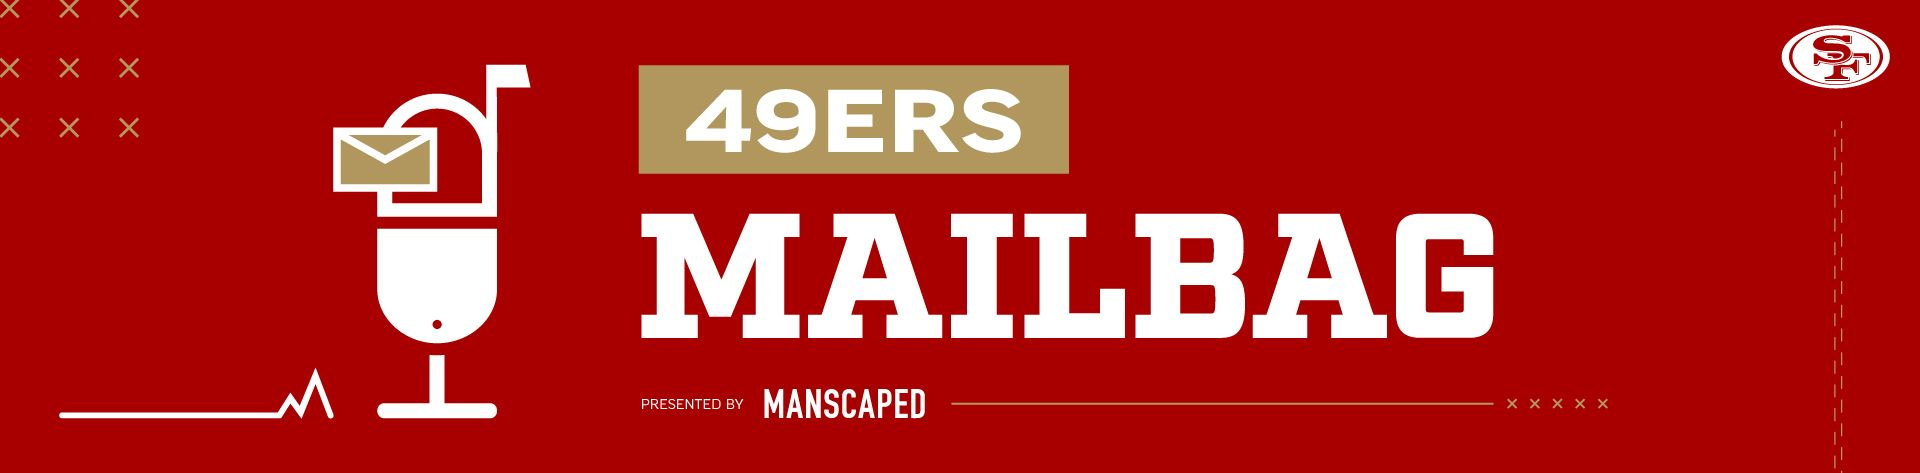 0605-2-49ERS-MAILBAG_final